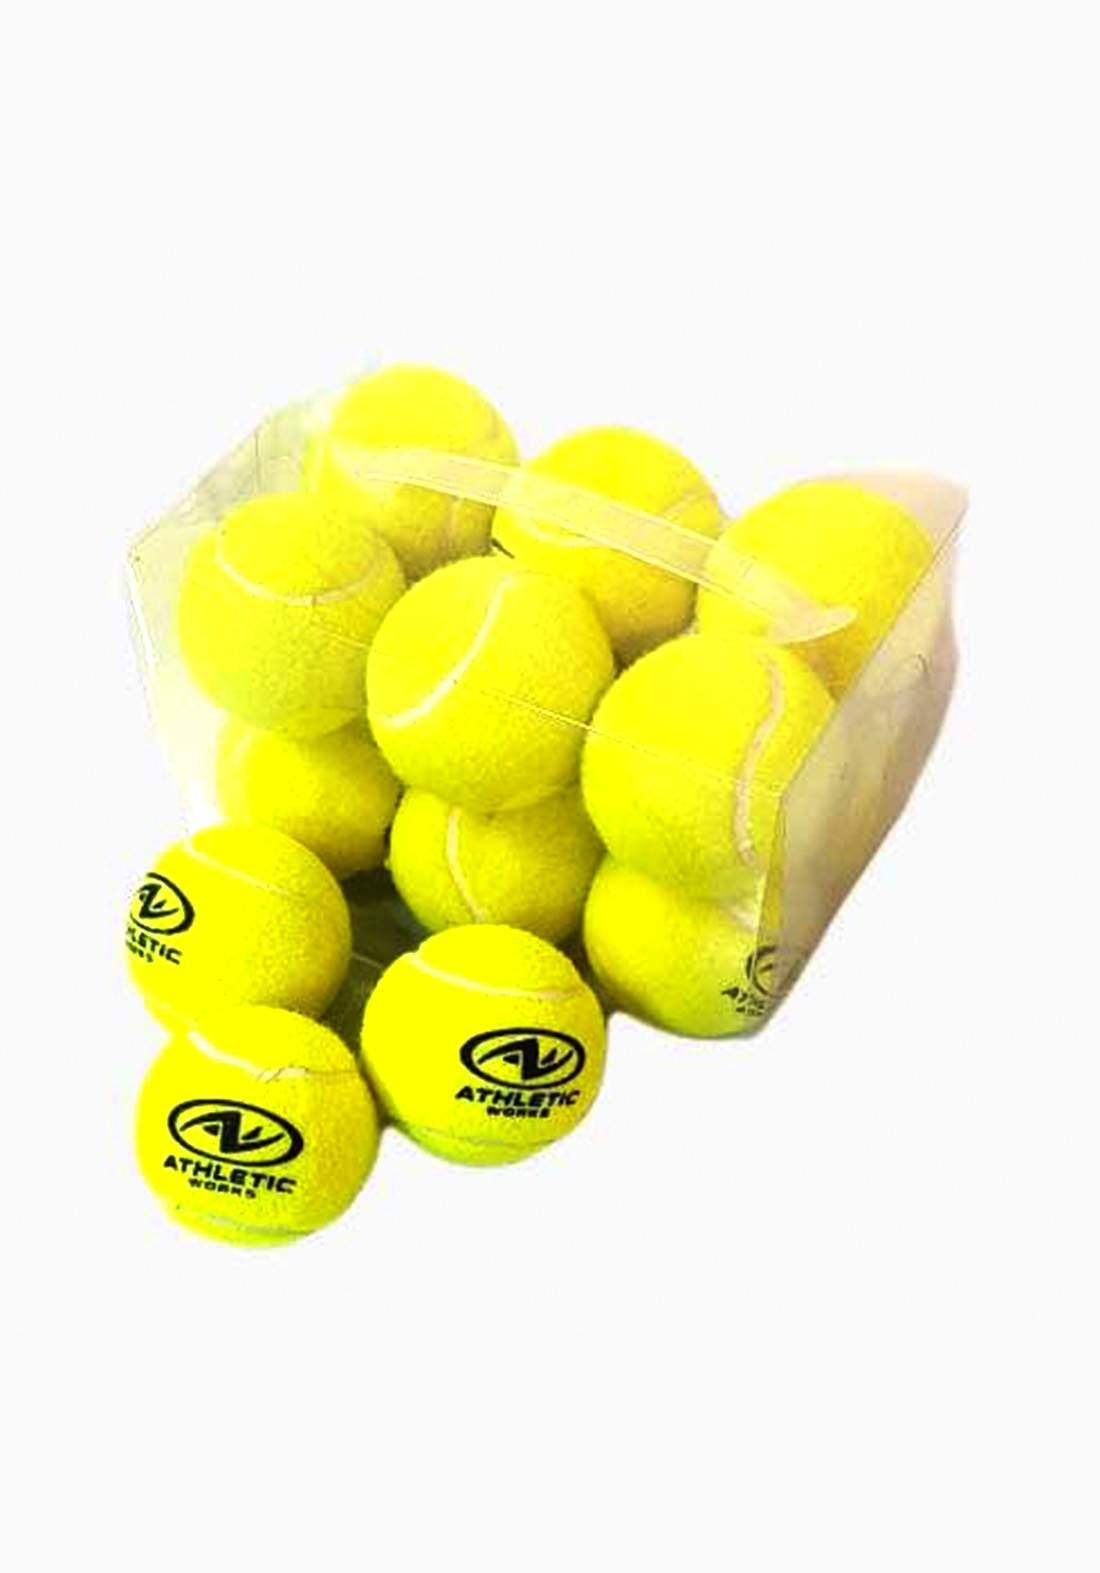 Athletic Tennis Ball Set 12 Pcs سيت كرات تنس